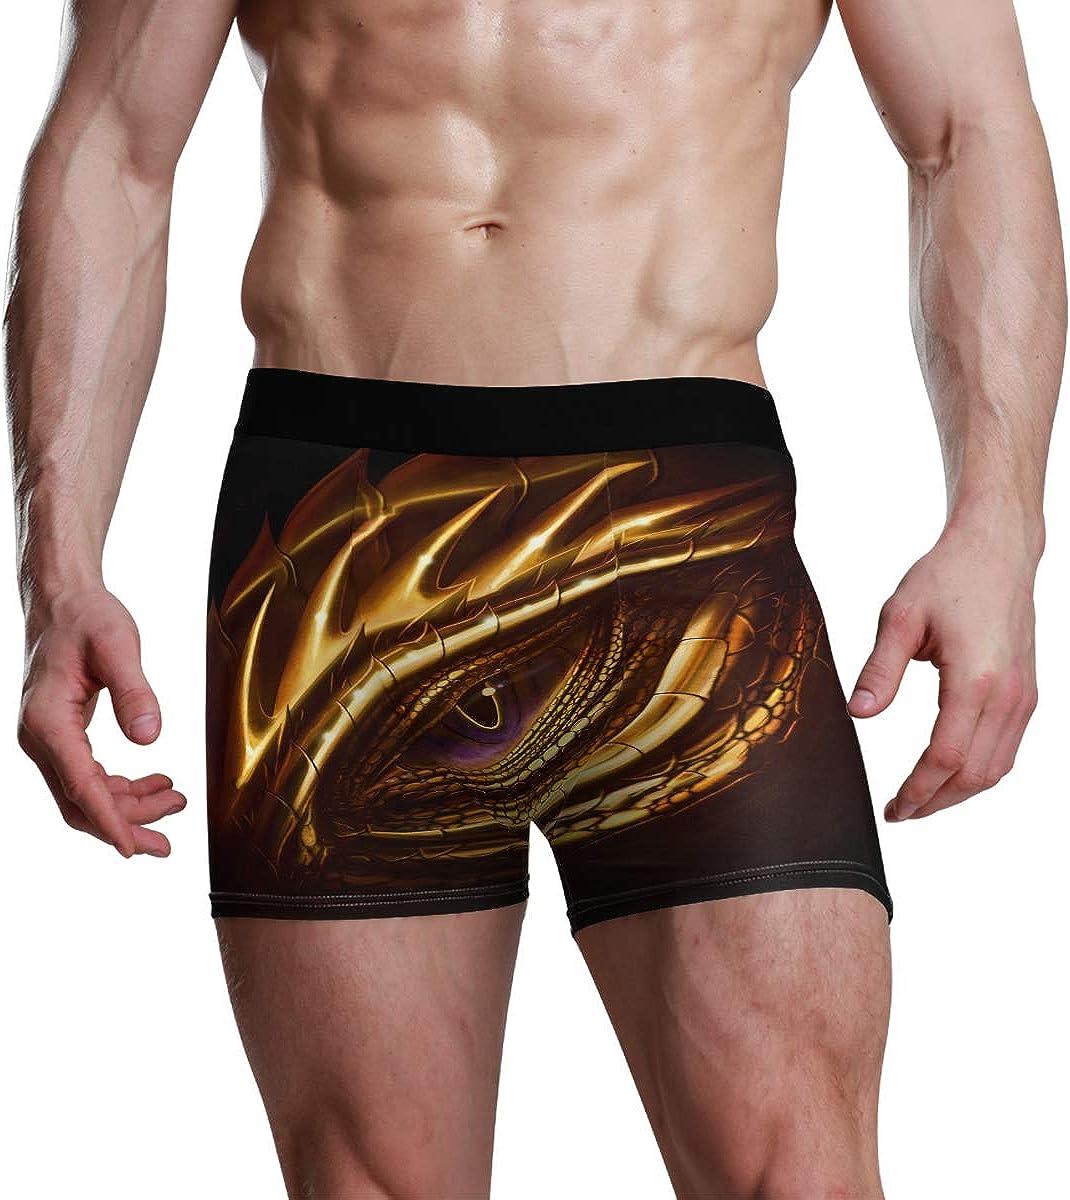 Mens Boxer Briefs Underwear Eye of Golden Dragon Cool Amazing Trunks Underwear Short Leg Boys